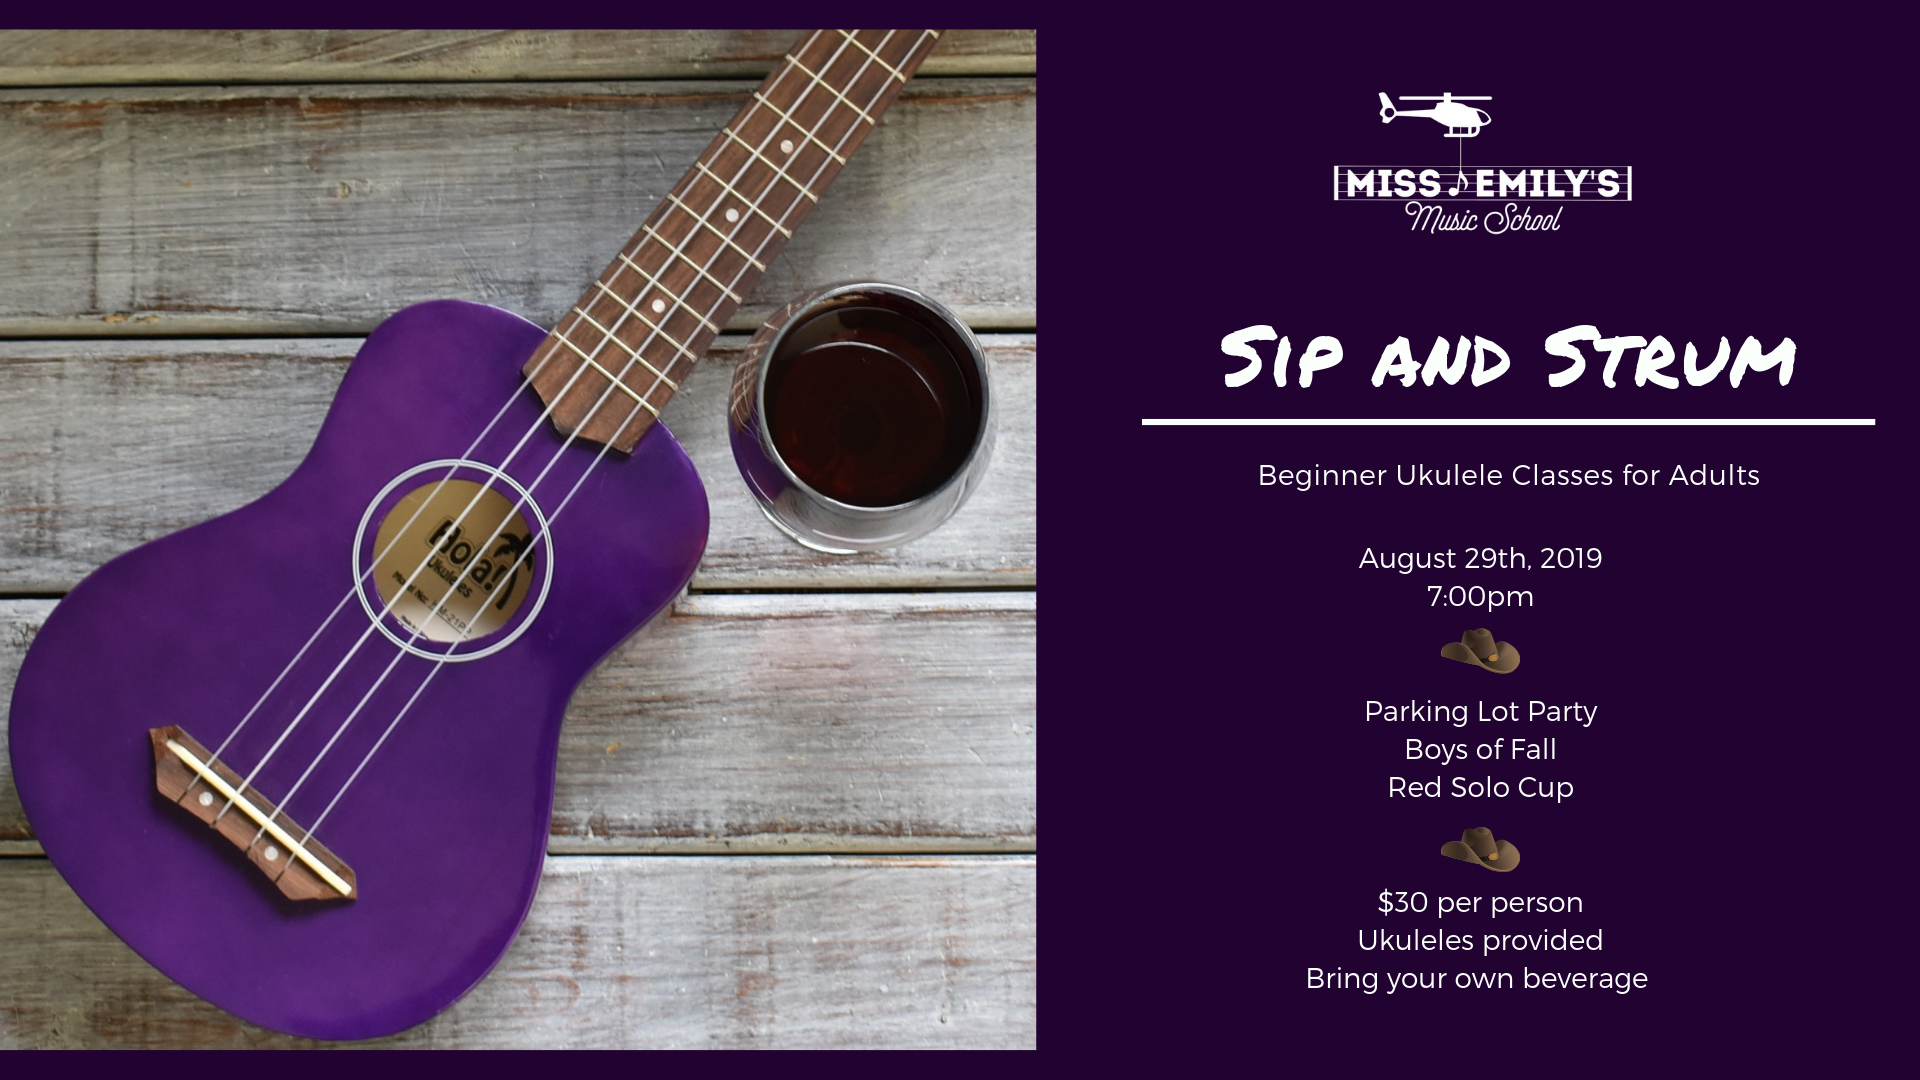 sip and strum ukulele classes manhattan ks